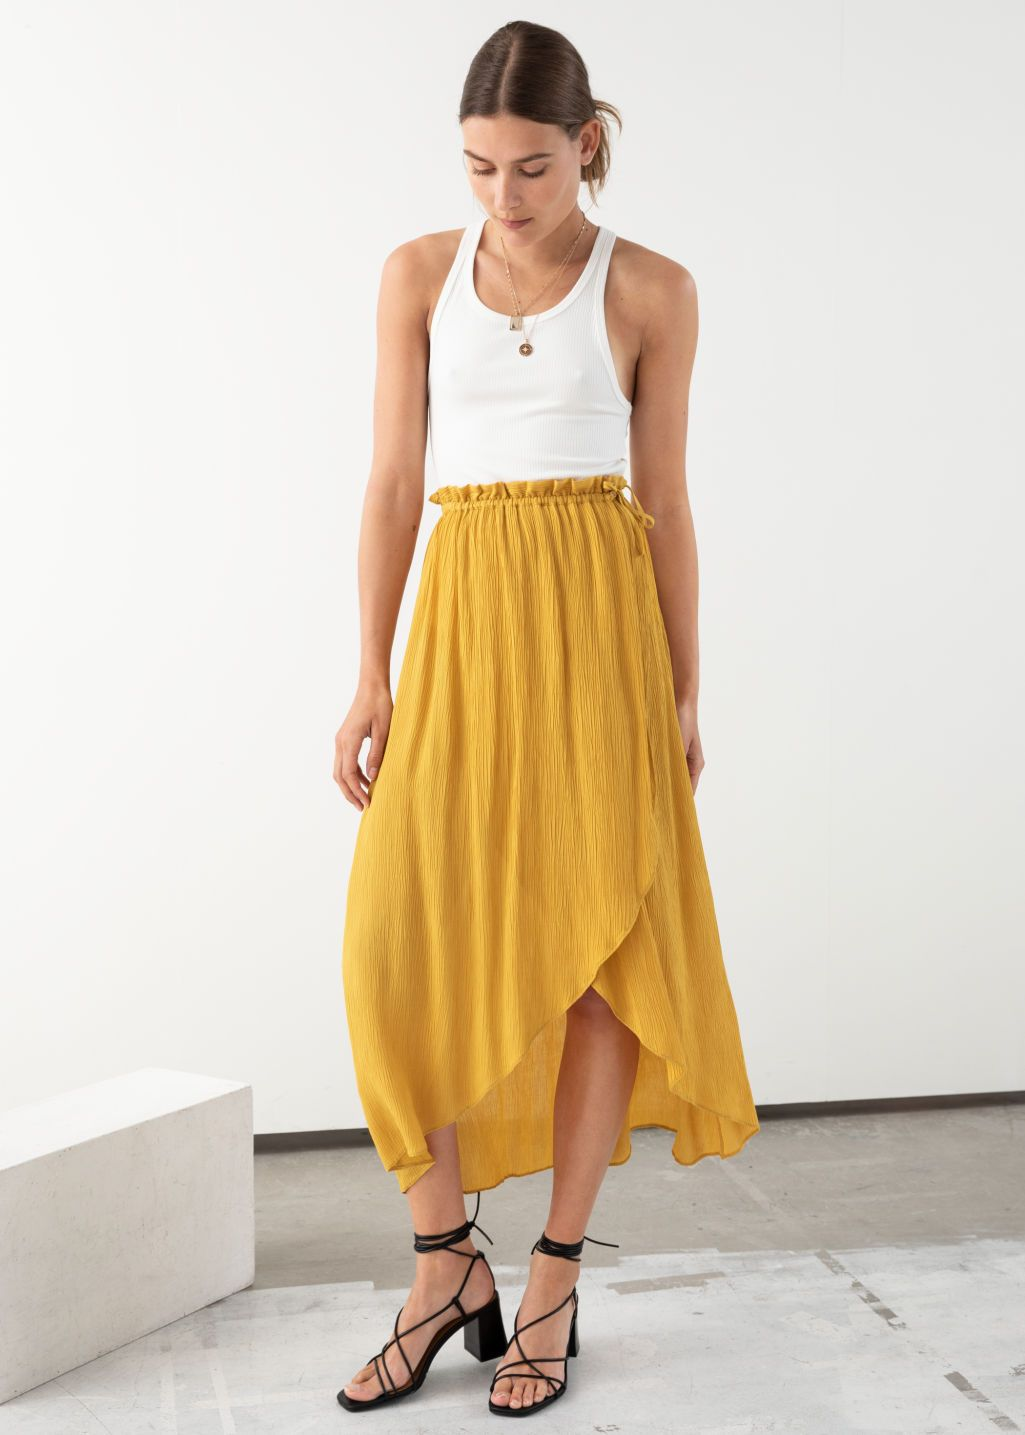 68b1a9964f8665 Paperbag Waist Wrap Skirt in 2019 | 255555 | Skirts, Skirt fashion ...